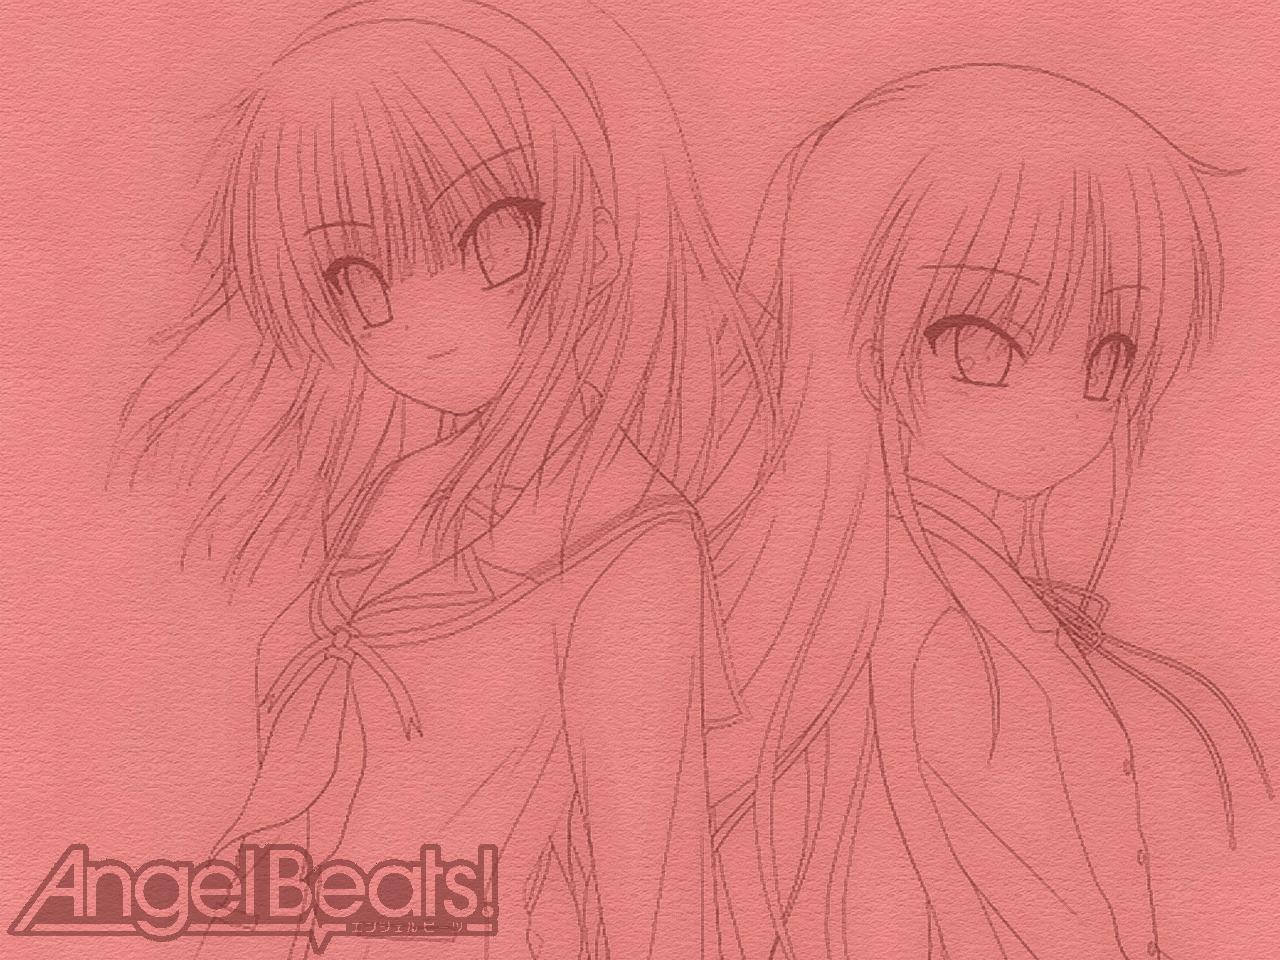 angel_beats!-16.jpg